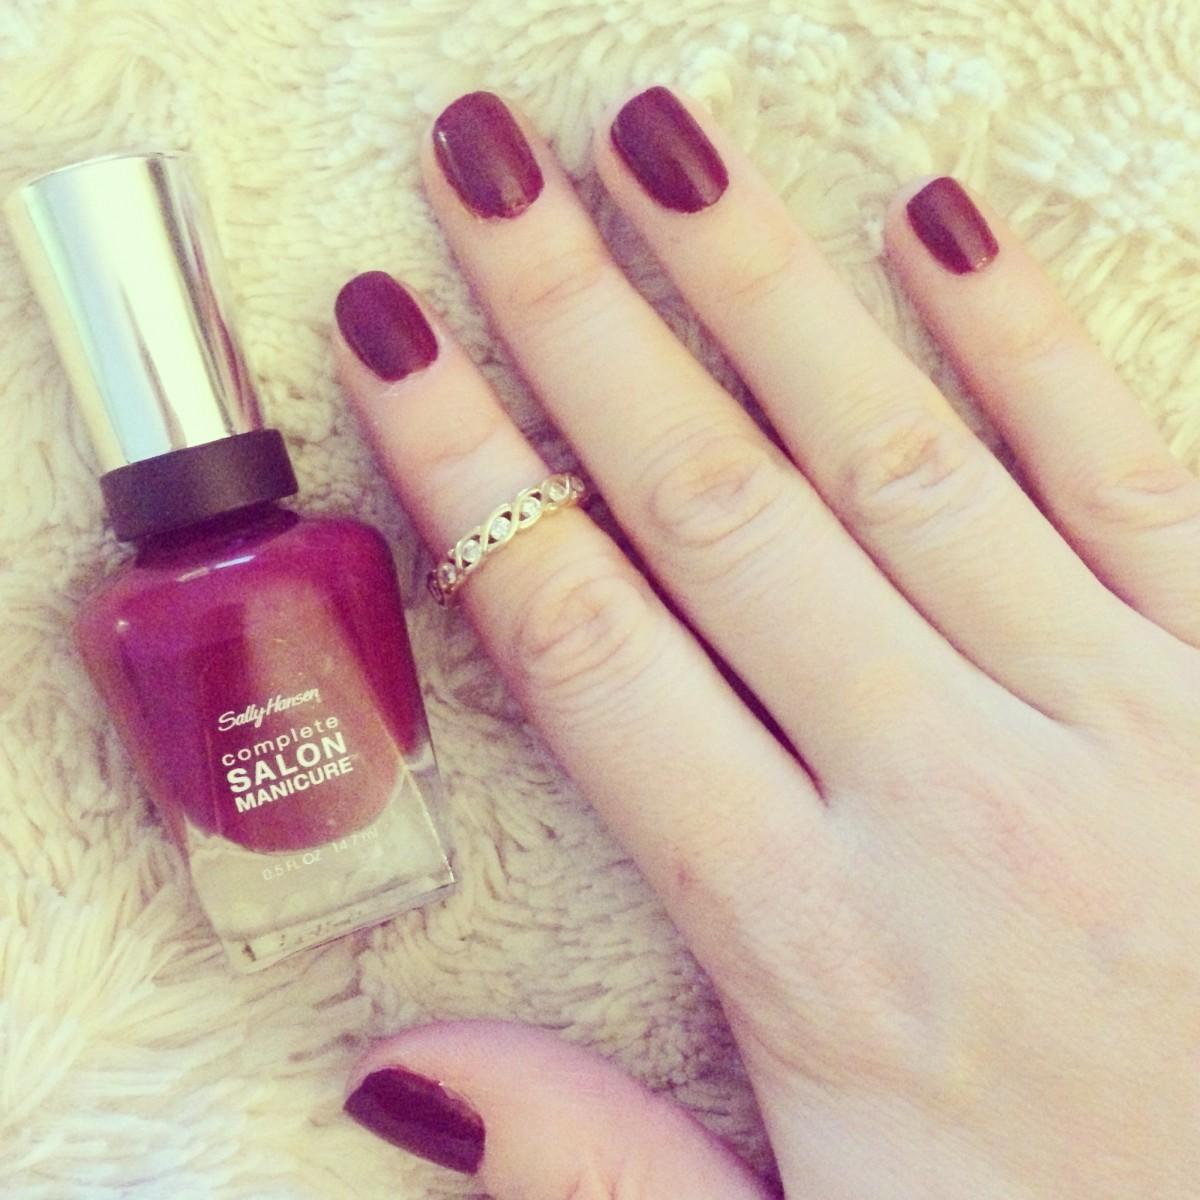 Beauty Panel Review: Sally Hansen Complete Salon Manicure - 29Secrets